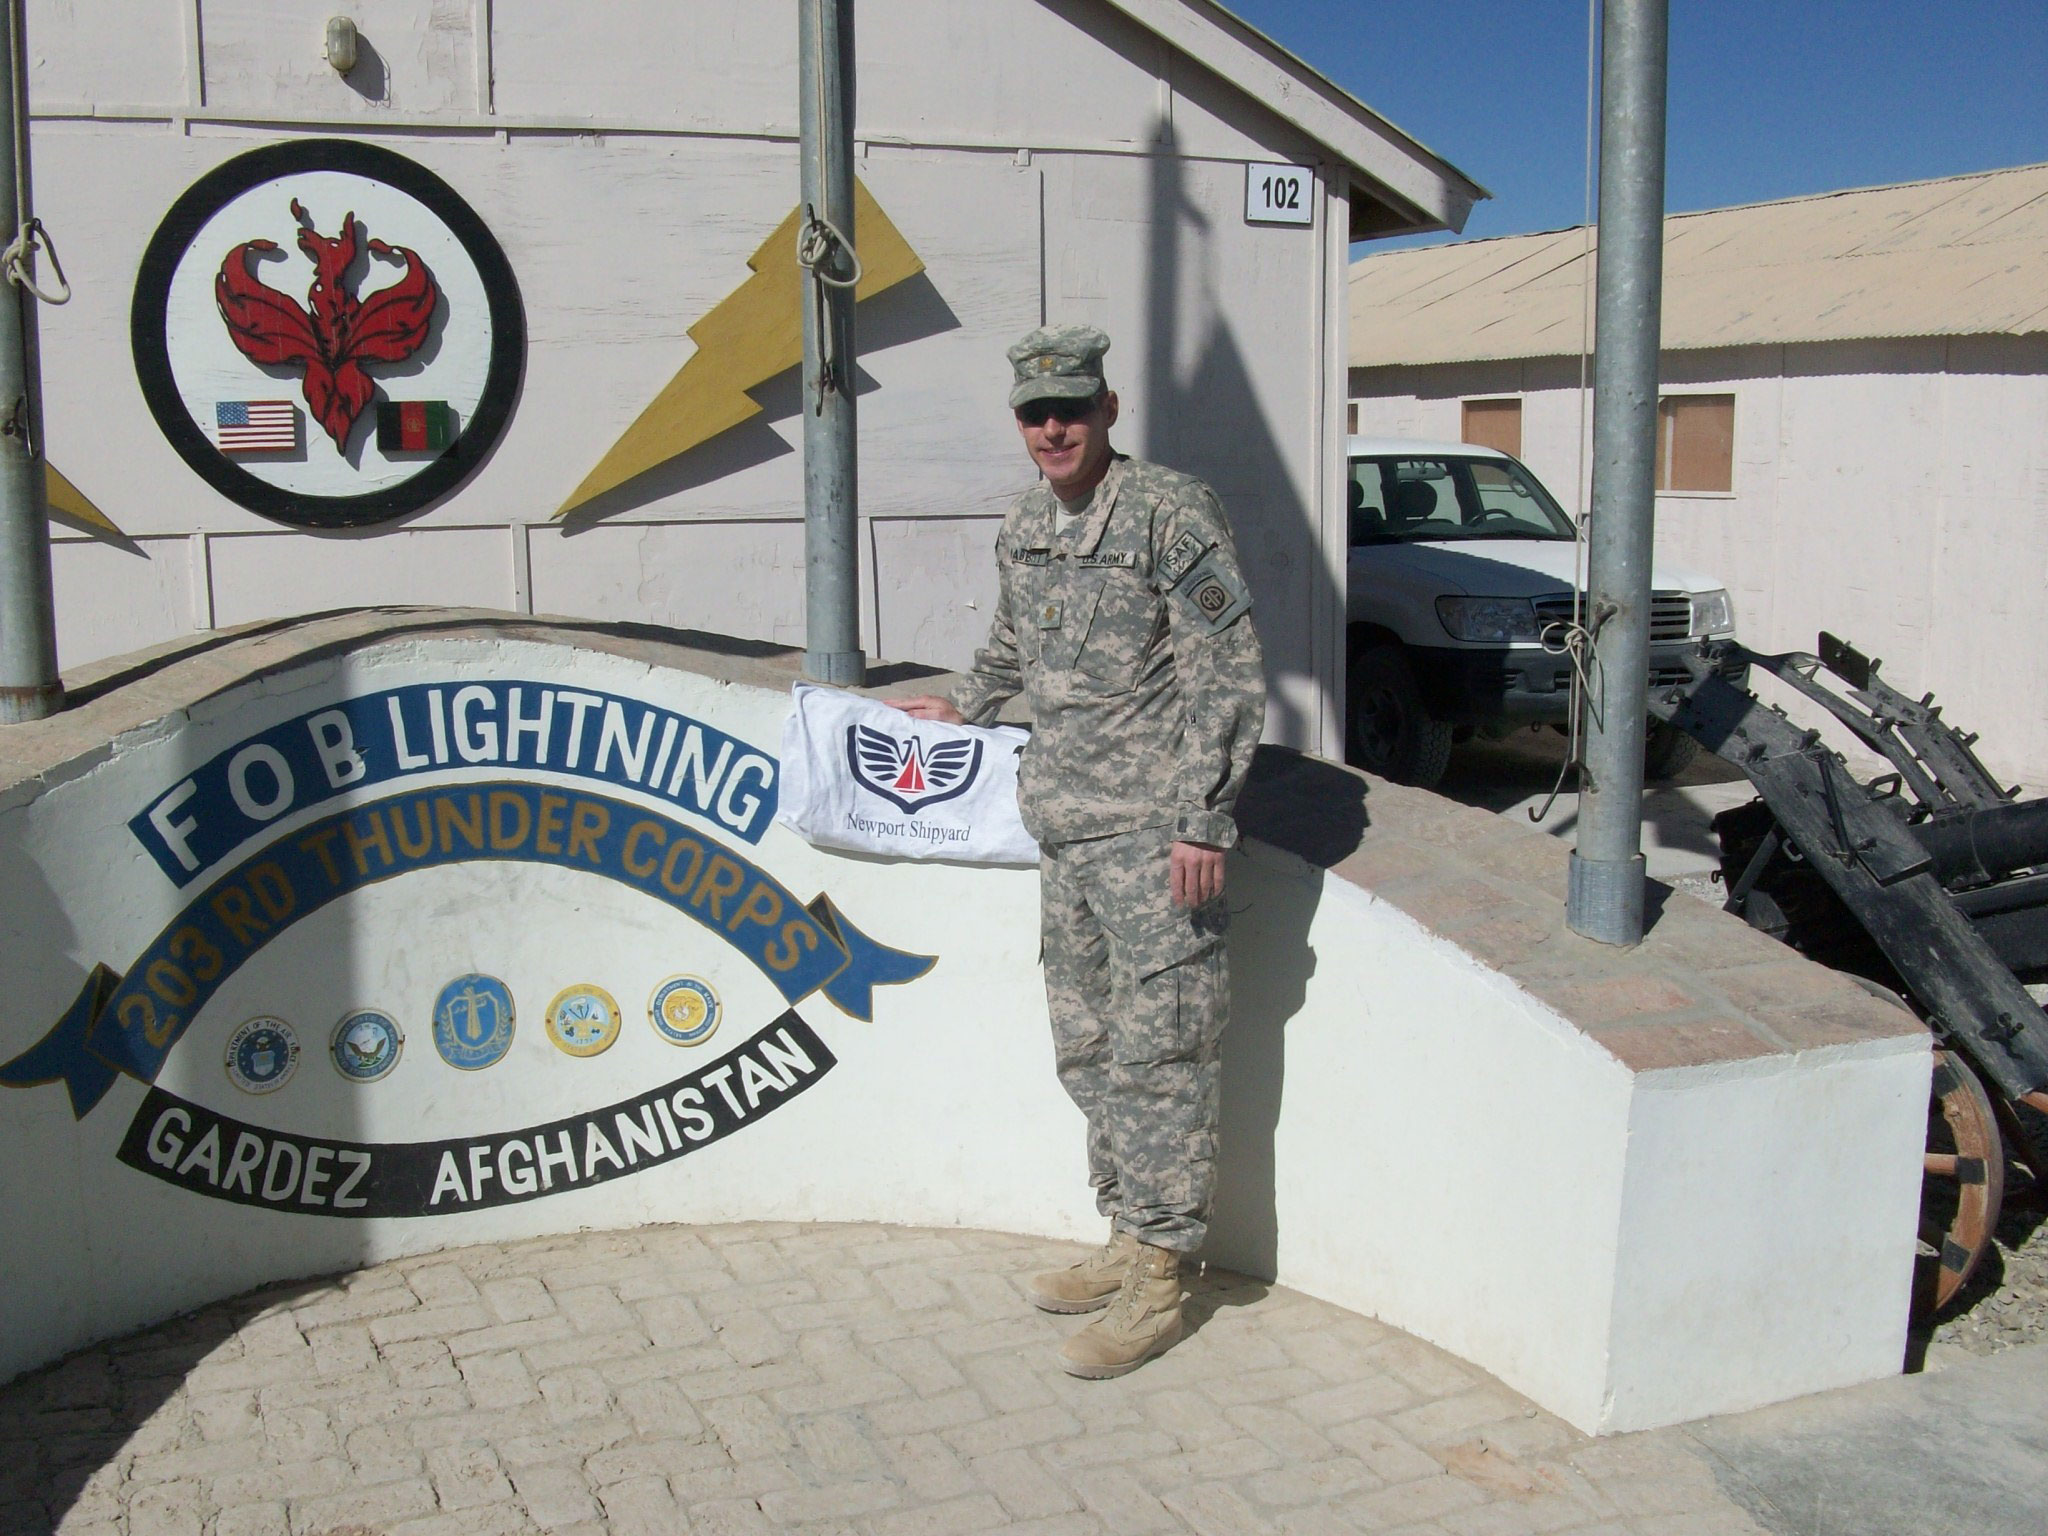 FlagAfghanistan.jpg